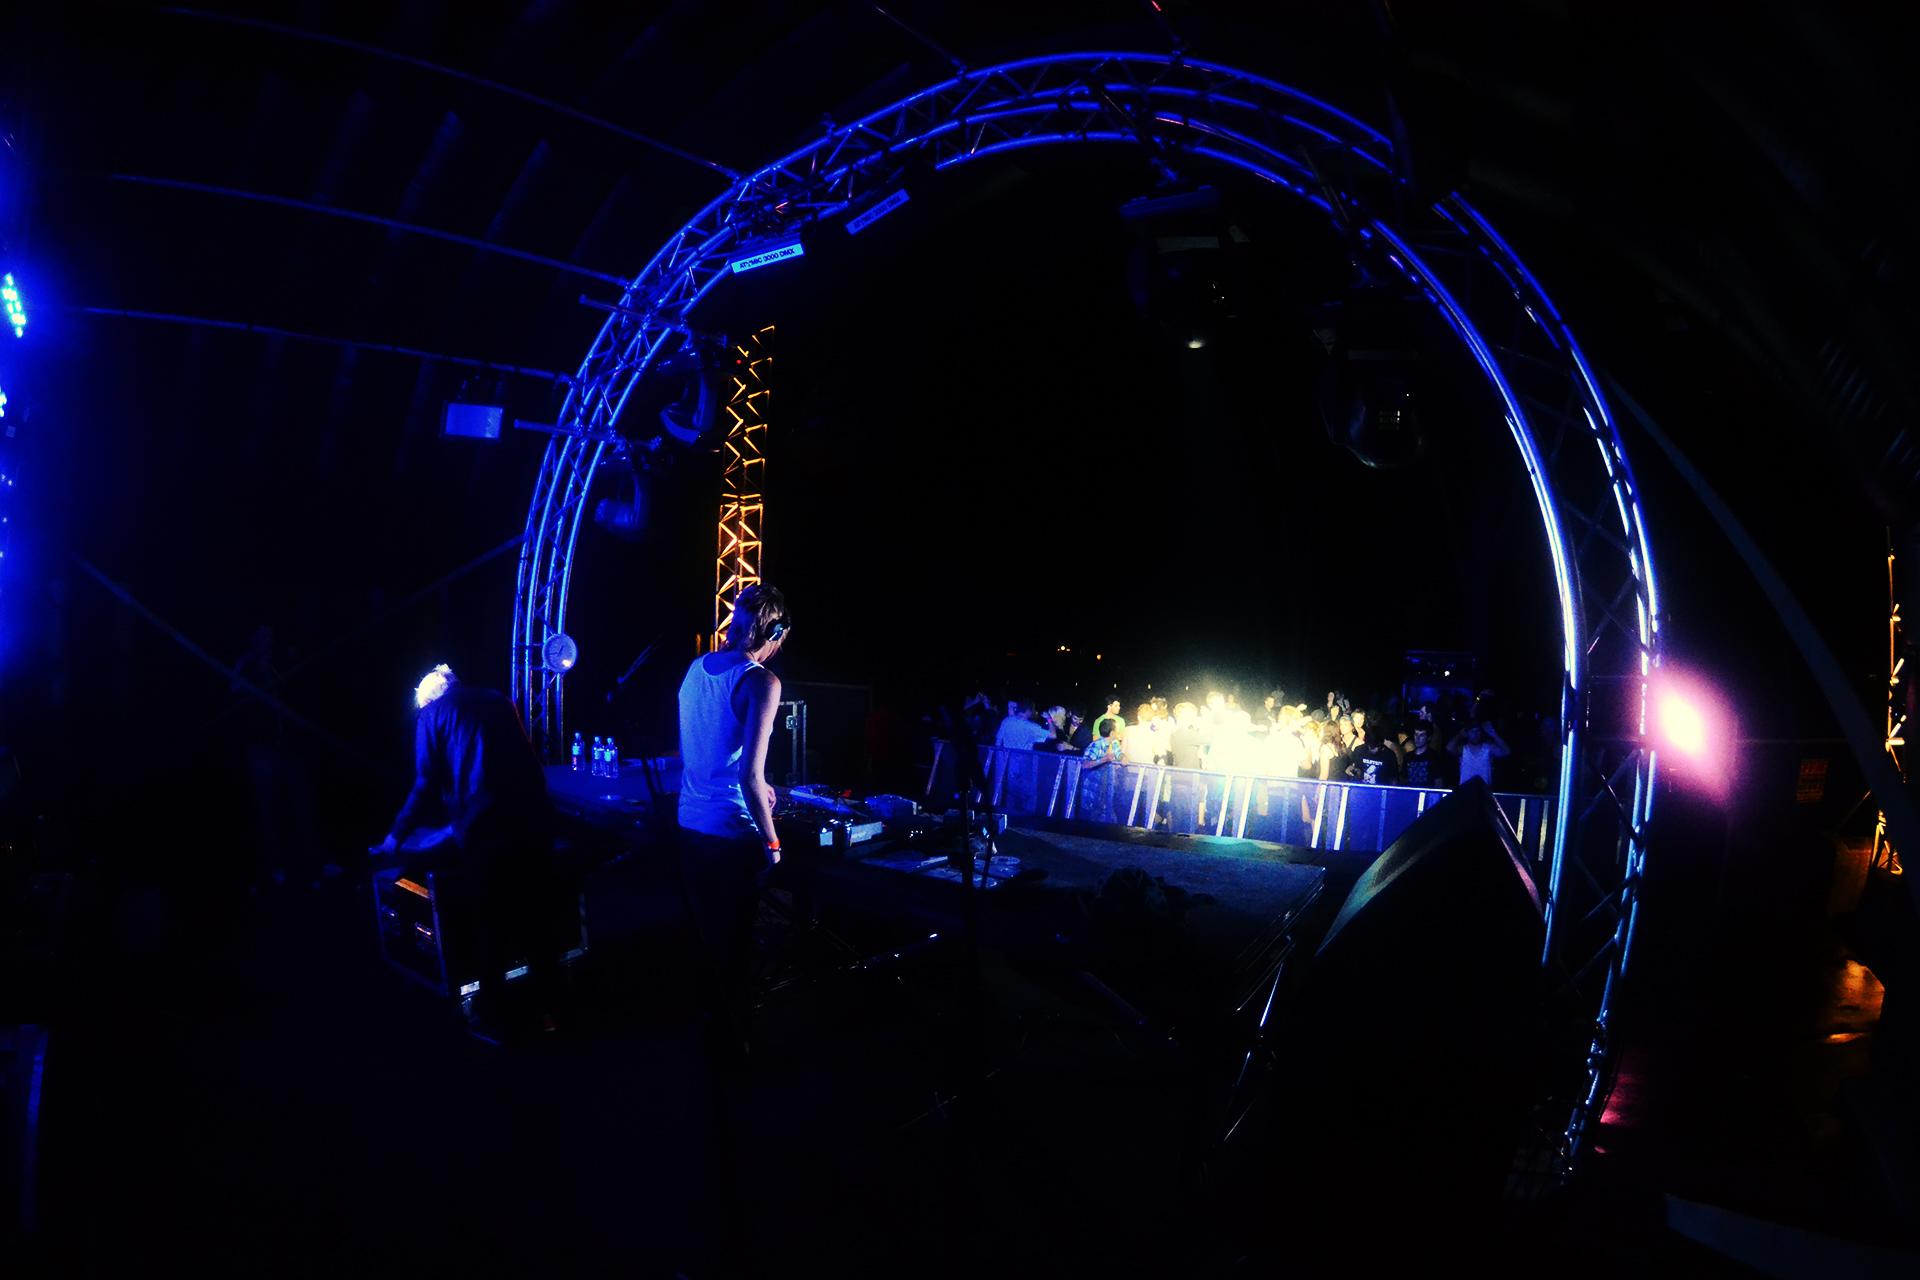 2010-10-22 - Tasmania - Carrick - Signature Festival - D3100--24.jpg